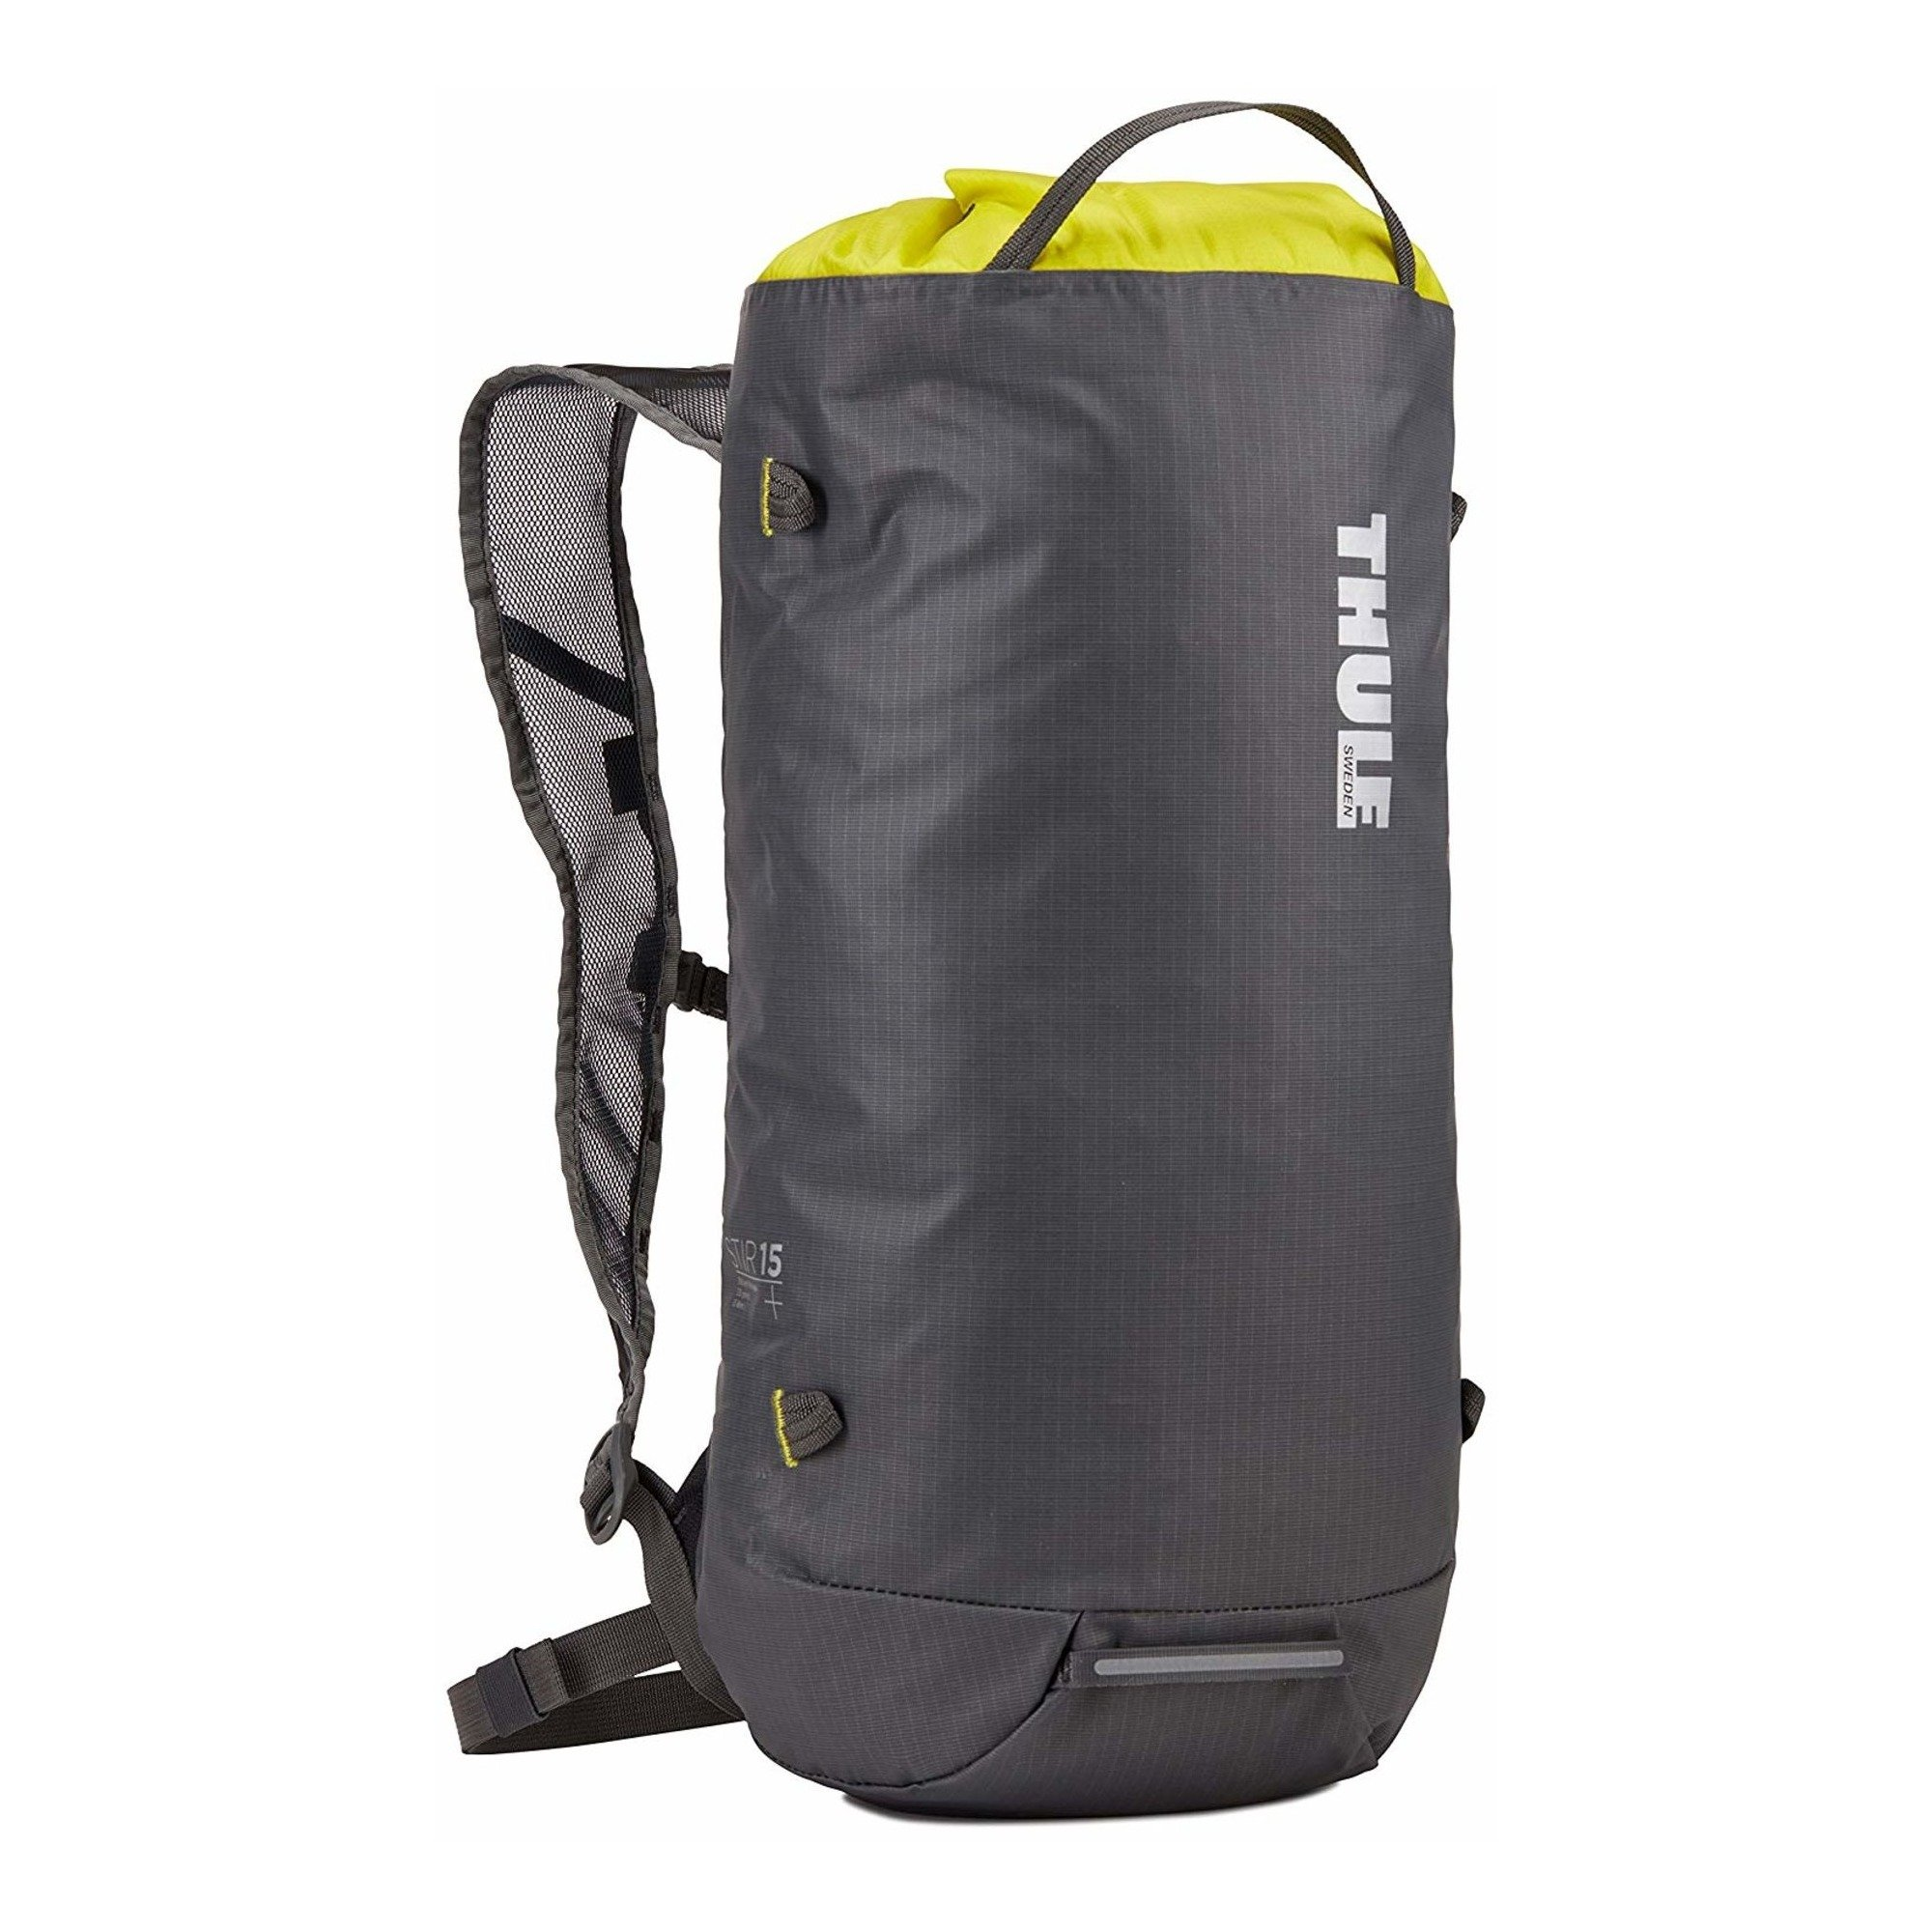 da3b1cf33d82d Plecak STIR HIKING PACK | plecaki i torby \ małe < 35 litrów plecaki ...